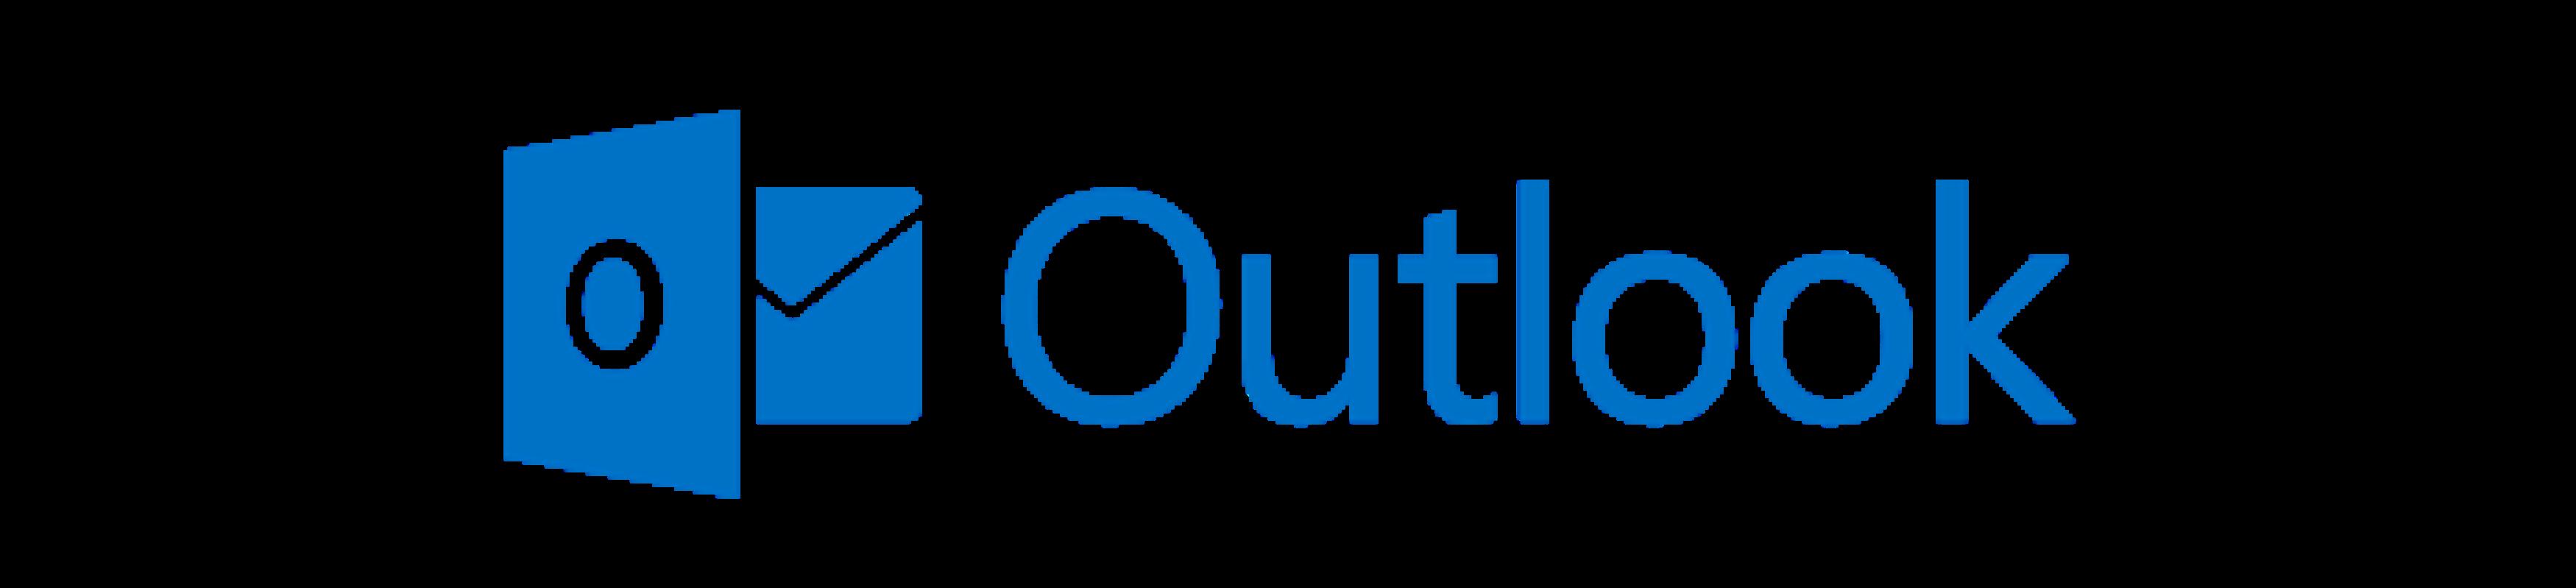 outlook-followup-crm-integration